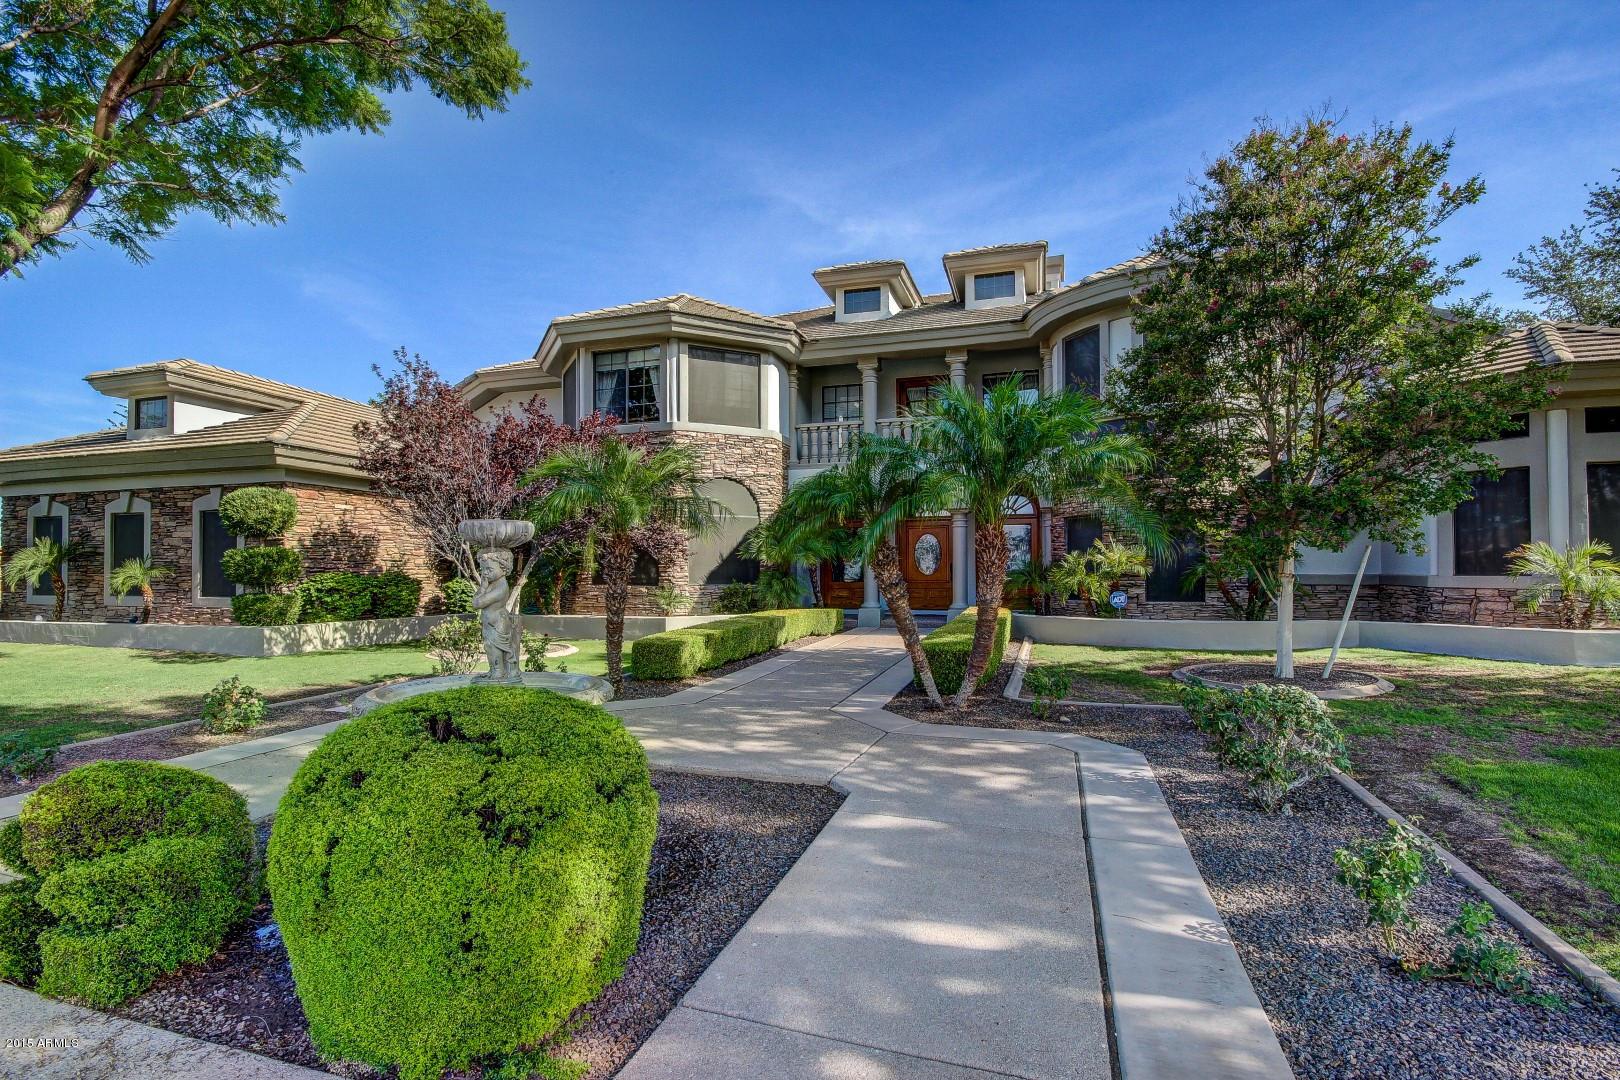 9638 W ELECTRA Lane, Peoria, AZ 85383 - North Scottsdale Cave Creek